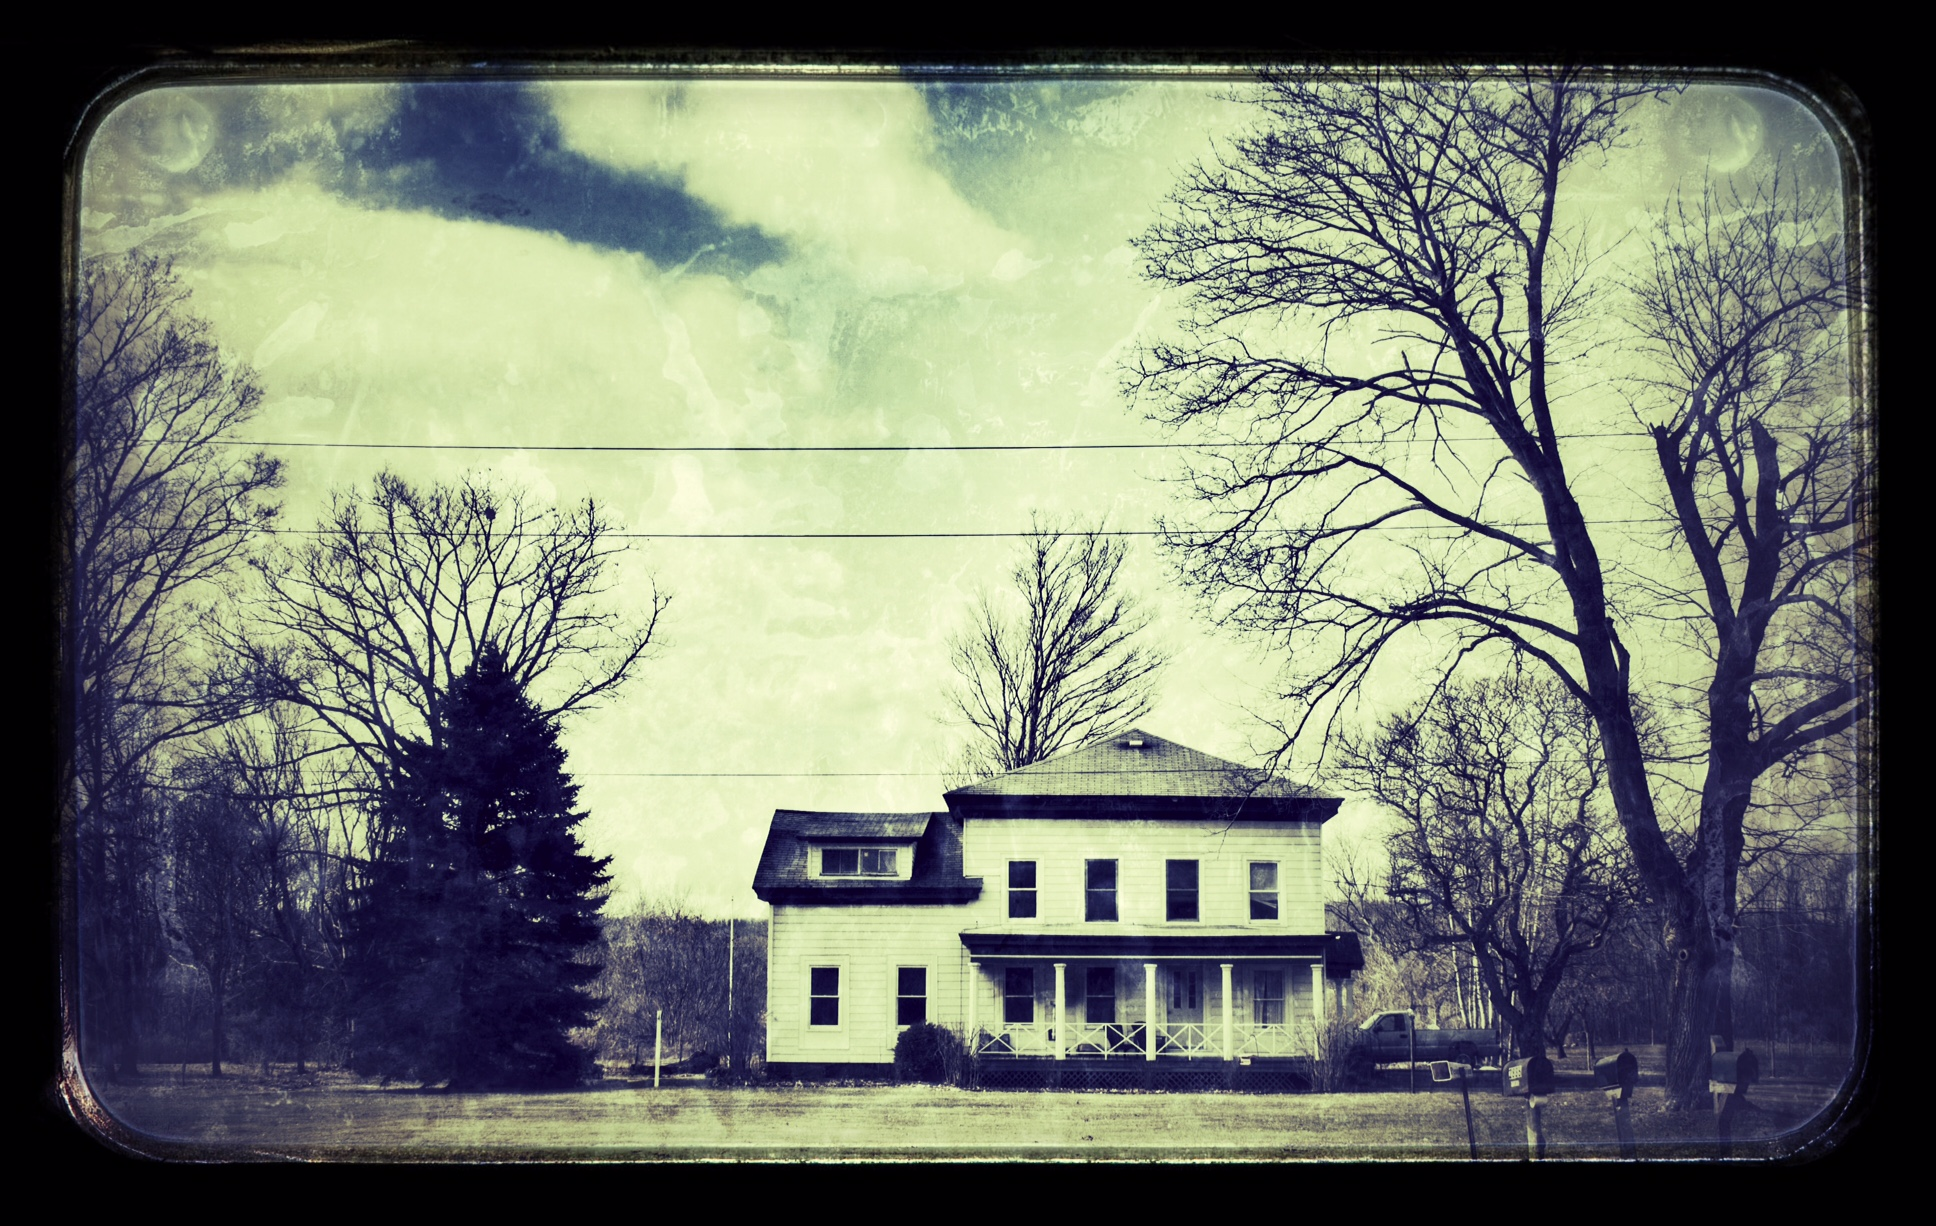 My haunted house.